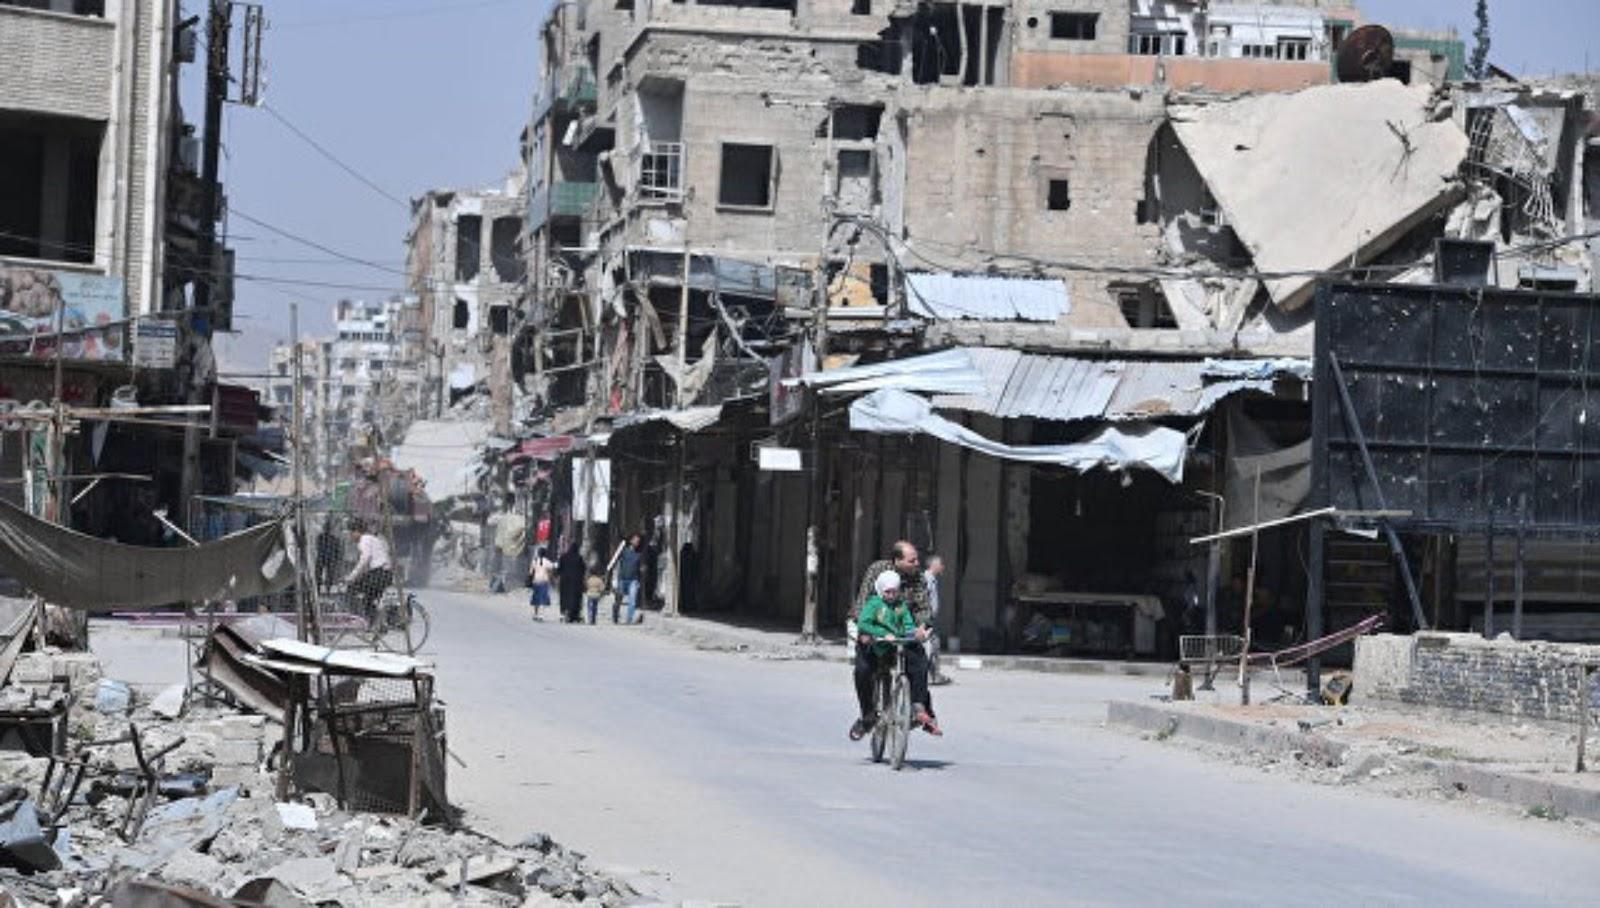 Pada 2017 Trump perintahkan menghancurkan Assad namun tak dijalankan Menhannya